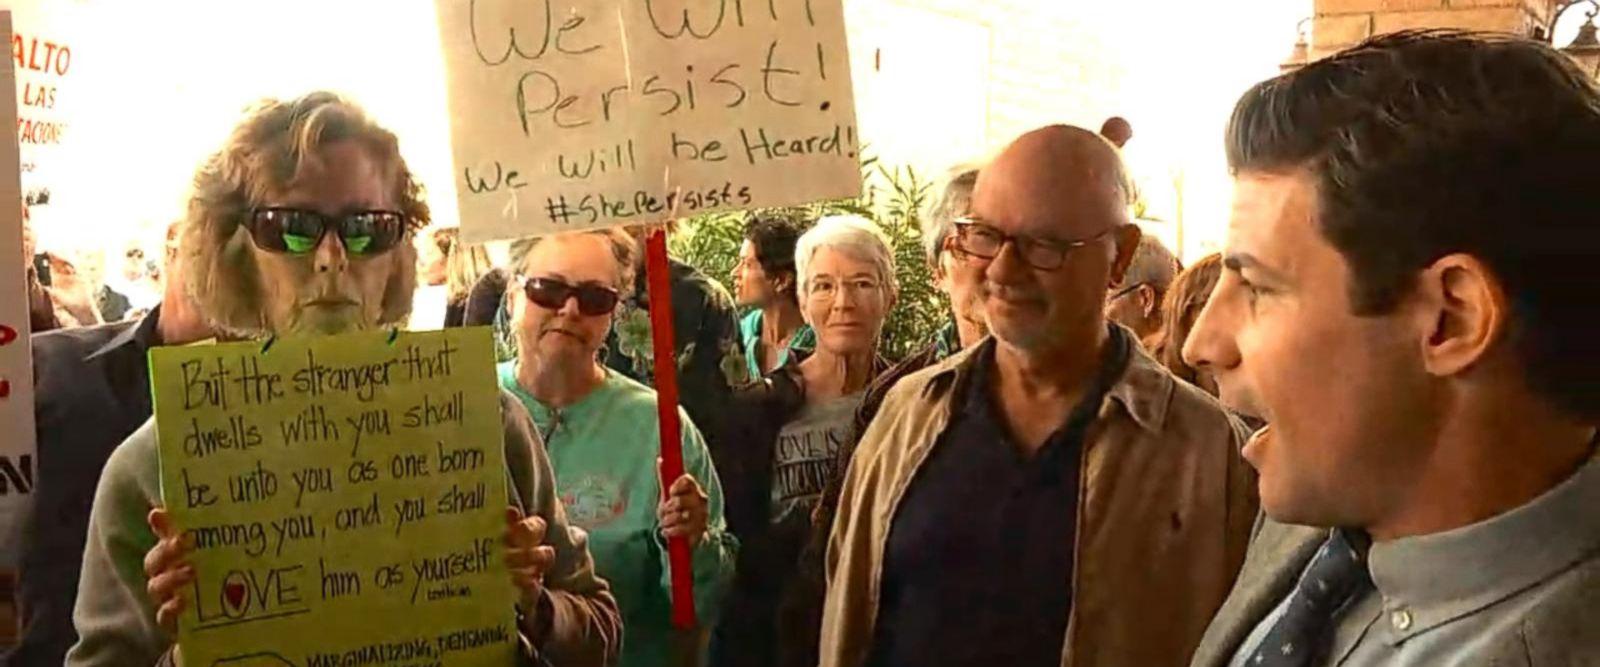 VIDEO: Protesters gather outside Rep. Martha McSally Town Hall in Sahuarita, AZ